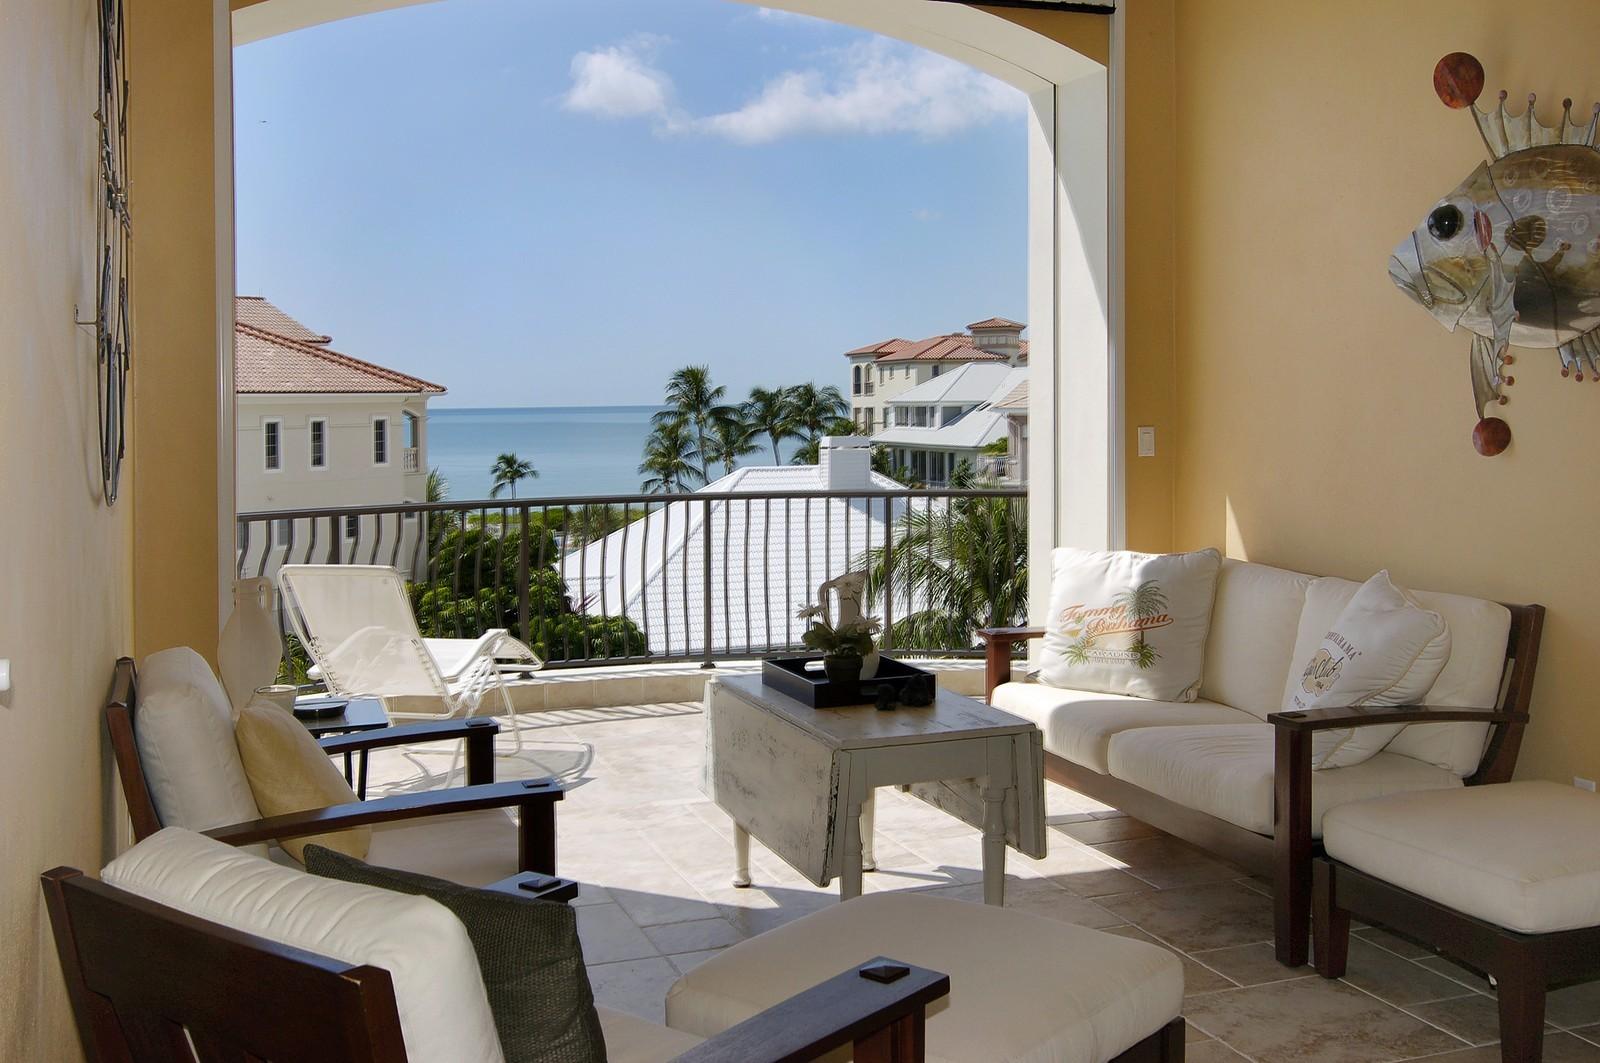 Real Estate Photography - 222 Barefoot Beach Blvd, Bonita Springs, FL, 34134 - Location 2